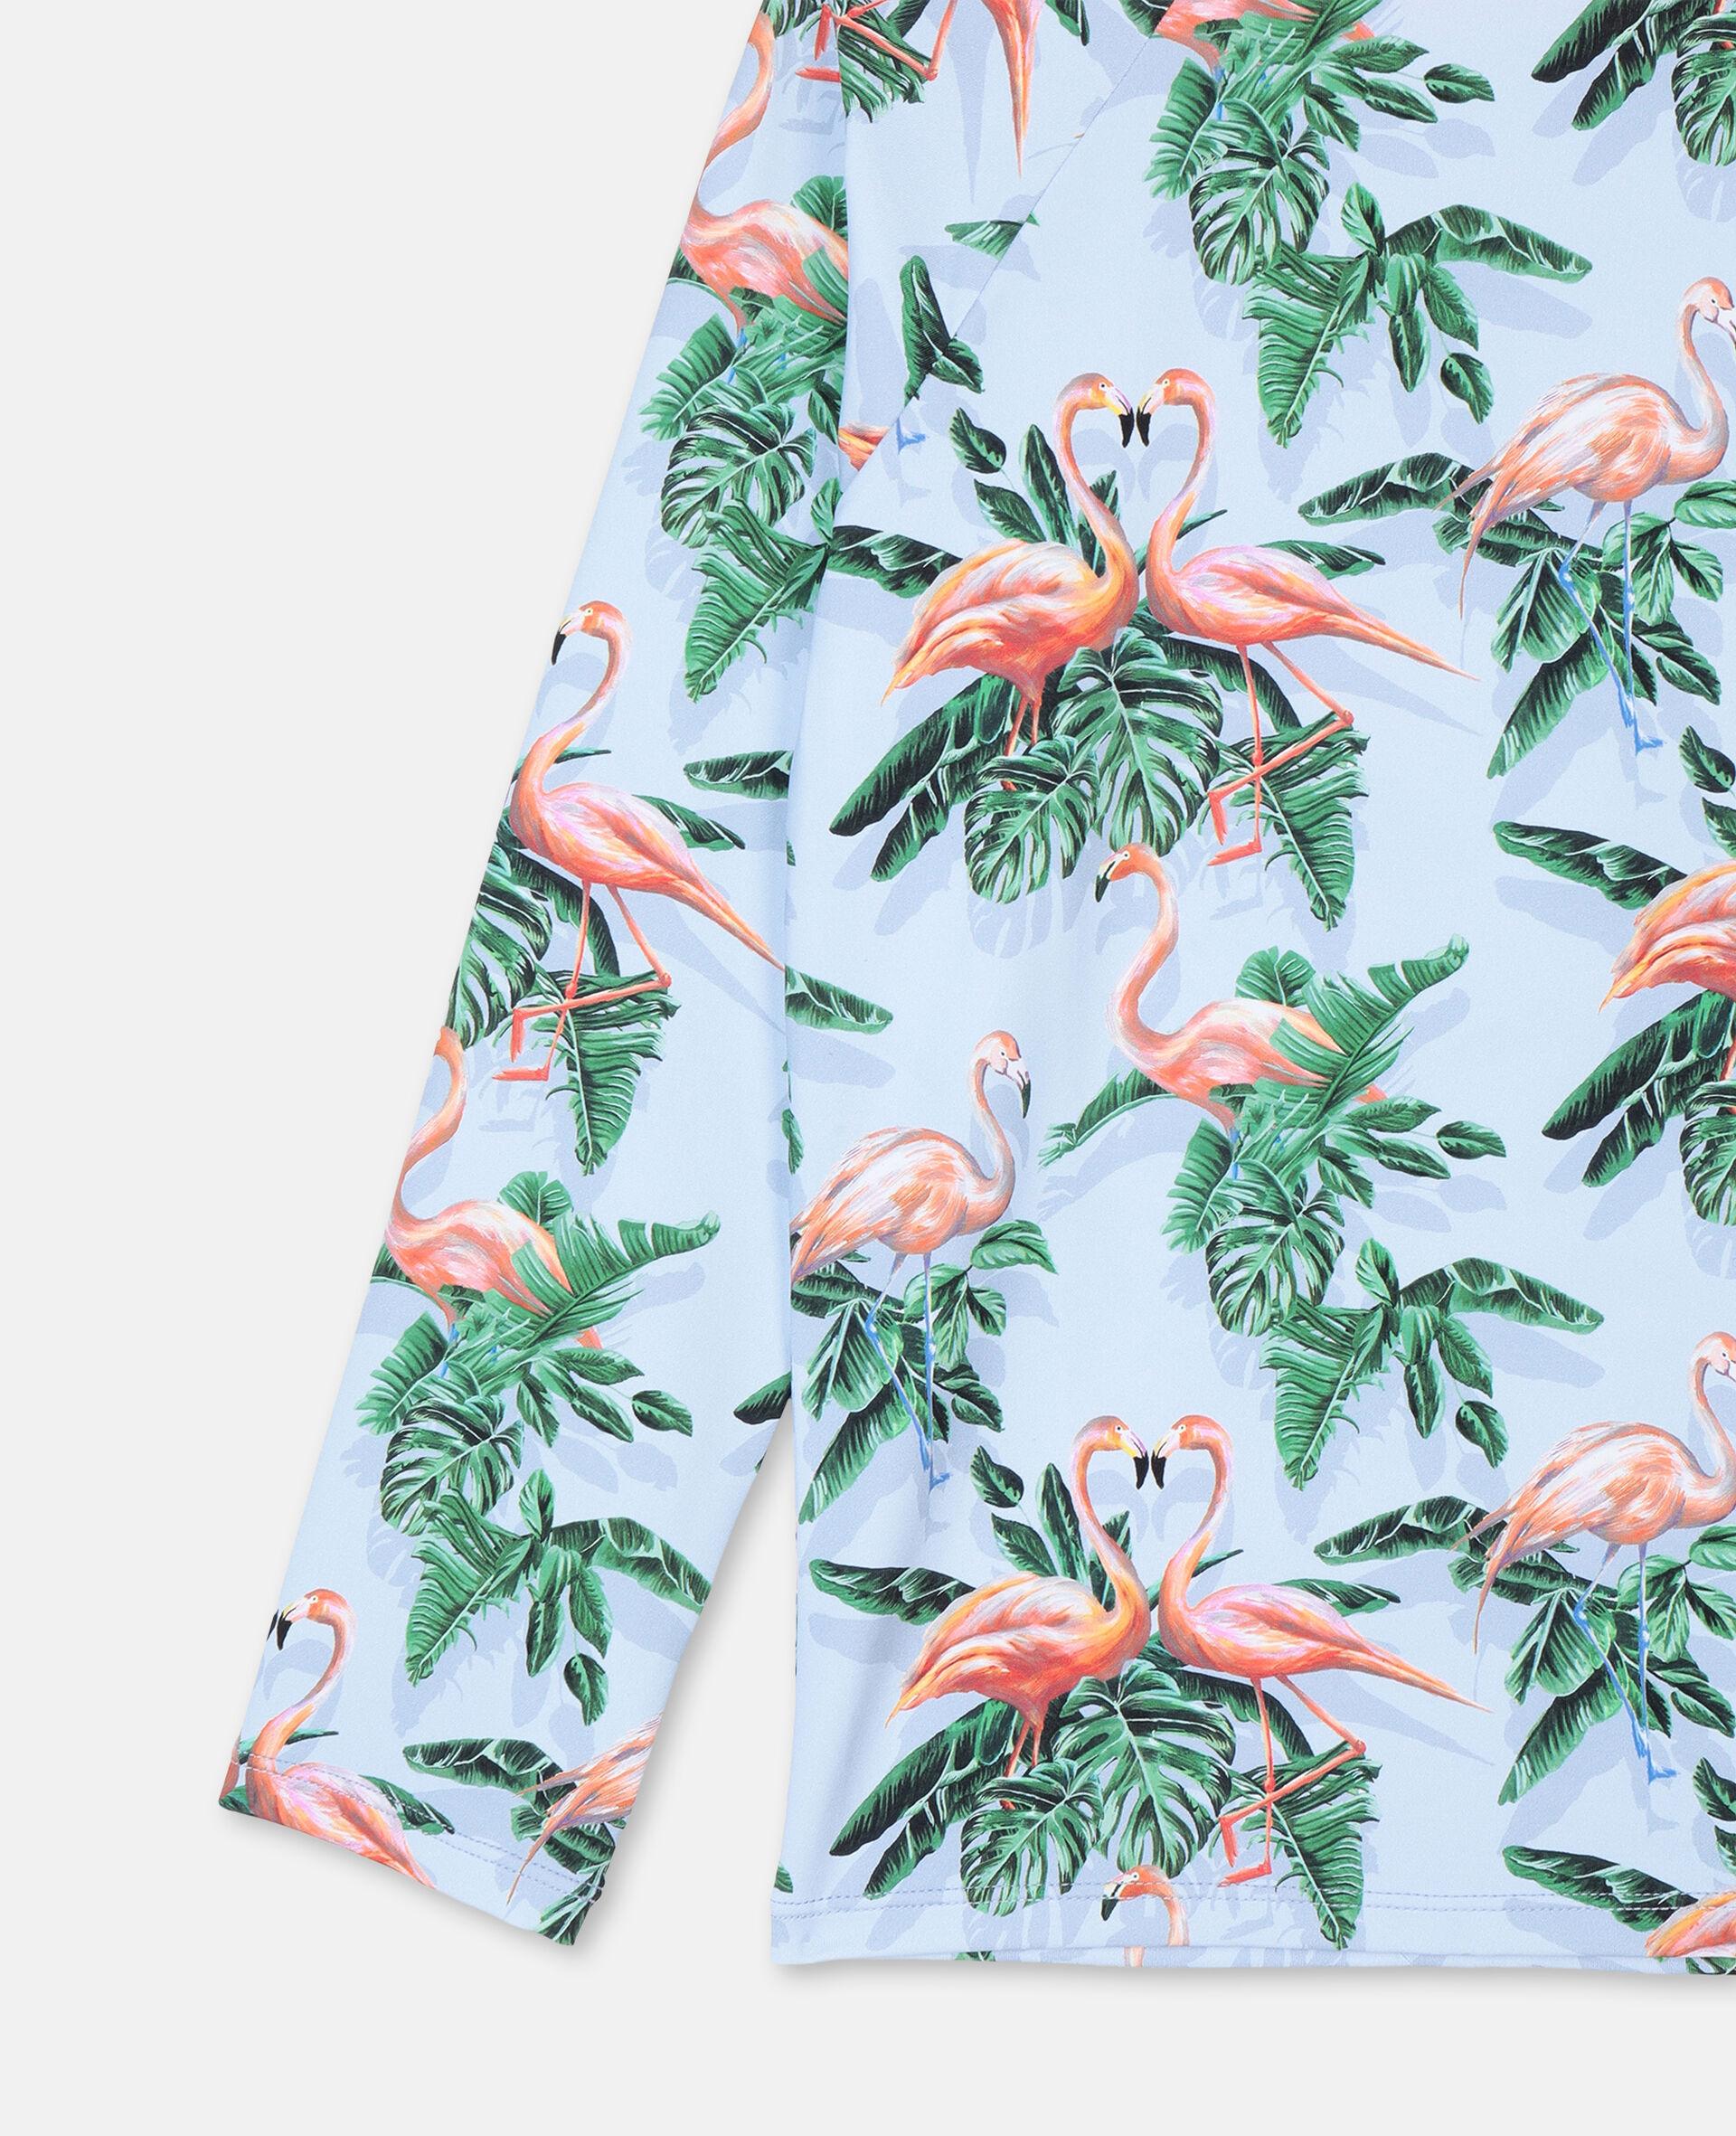 Painty Flamingo游泳T恤 -绿色-large image number 1